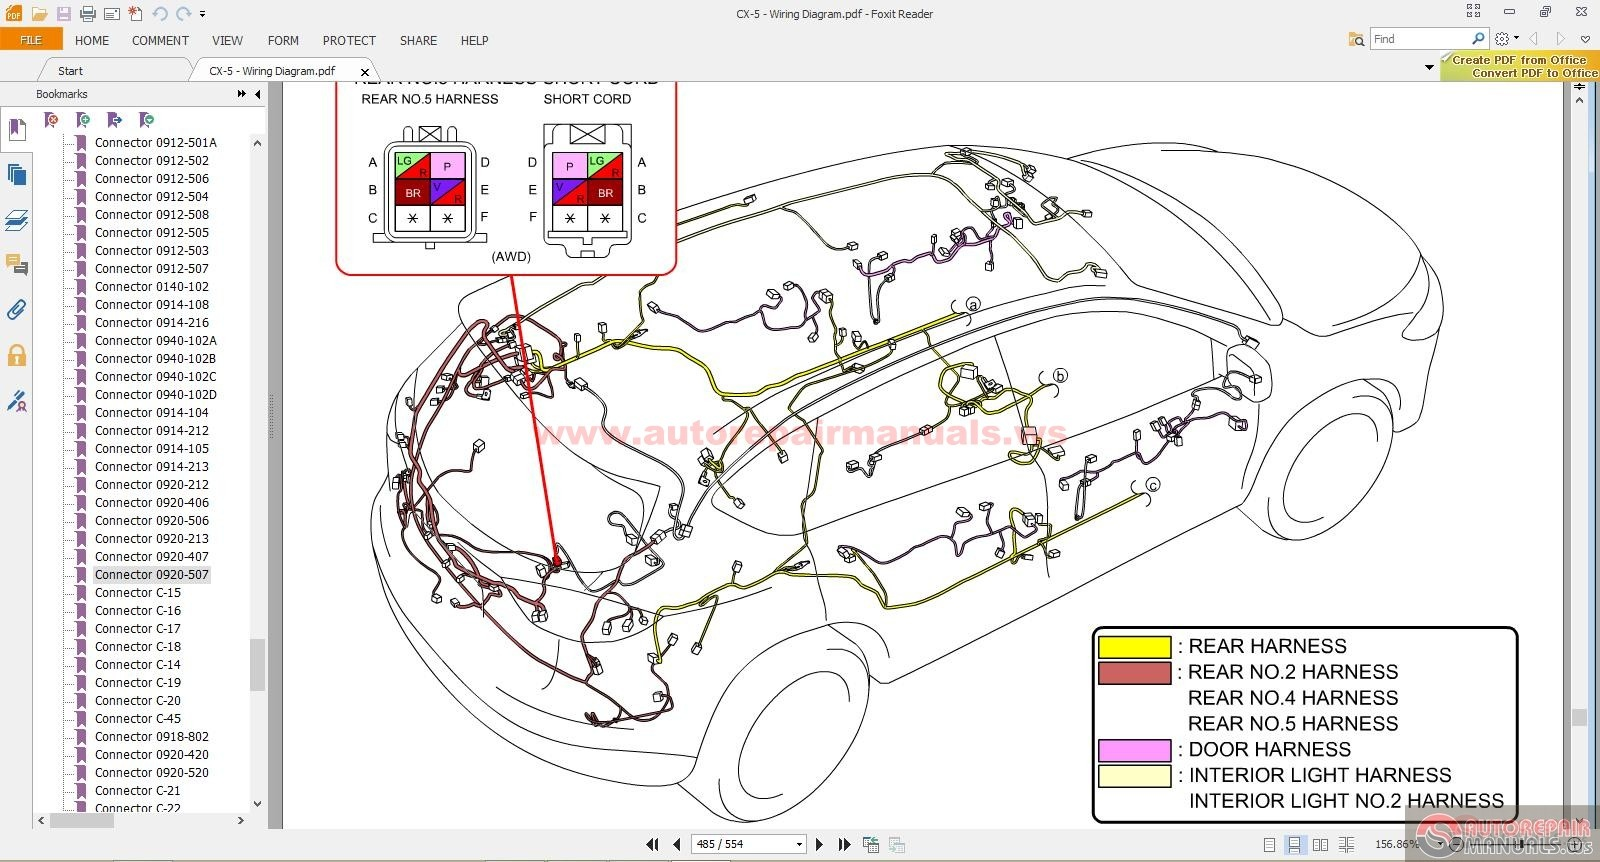 wiring diagram mazda cx 5 wiring diagram portal wiring diagram 91 mazda b2600 2014 mazda 2 wiring diagram [ 1600 x 862 Pixel ]